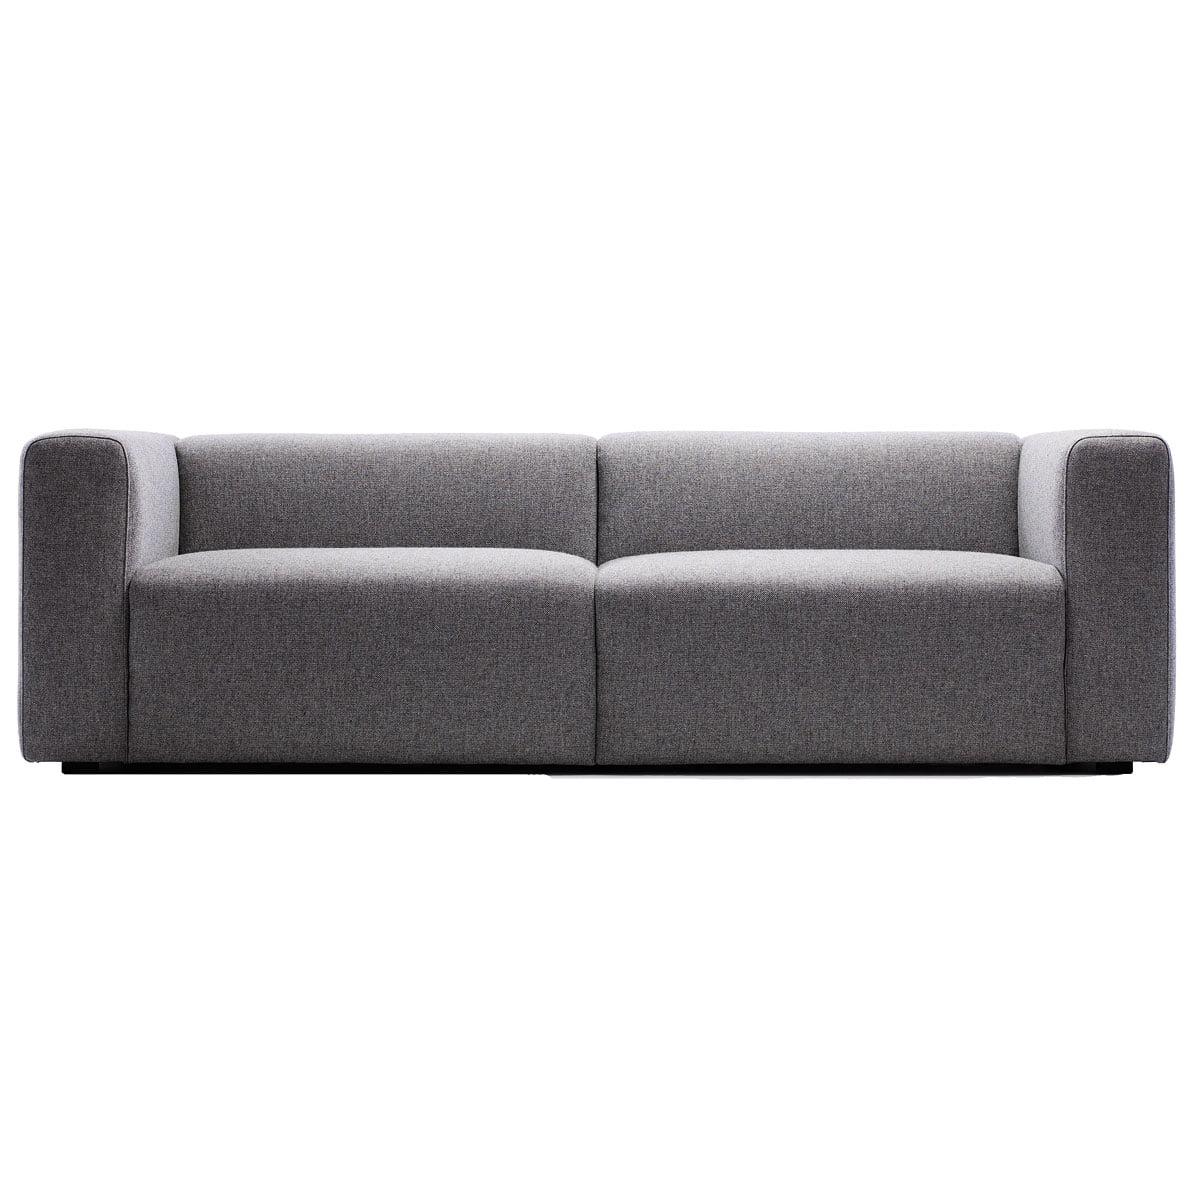 mags sofa 2 5 sitzer von hay connox. Black Bedroom Furniture Sets. Home Design Ideas